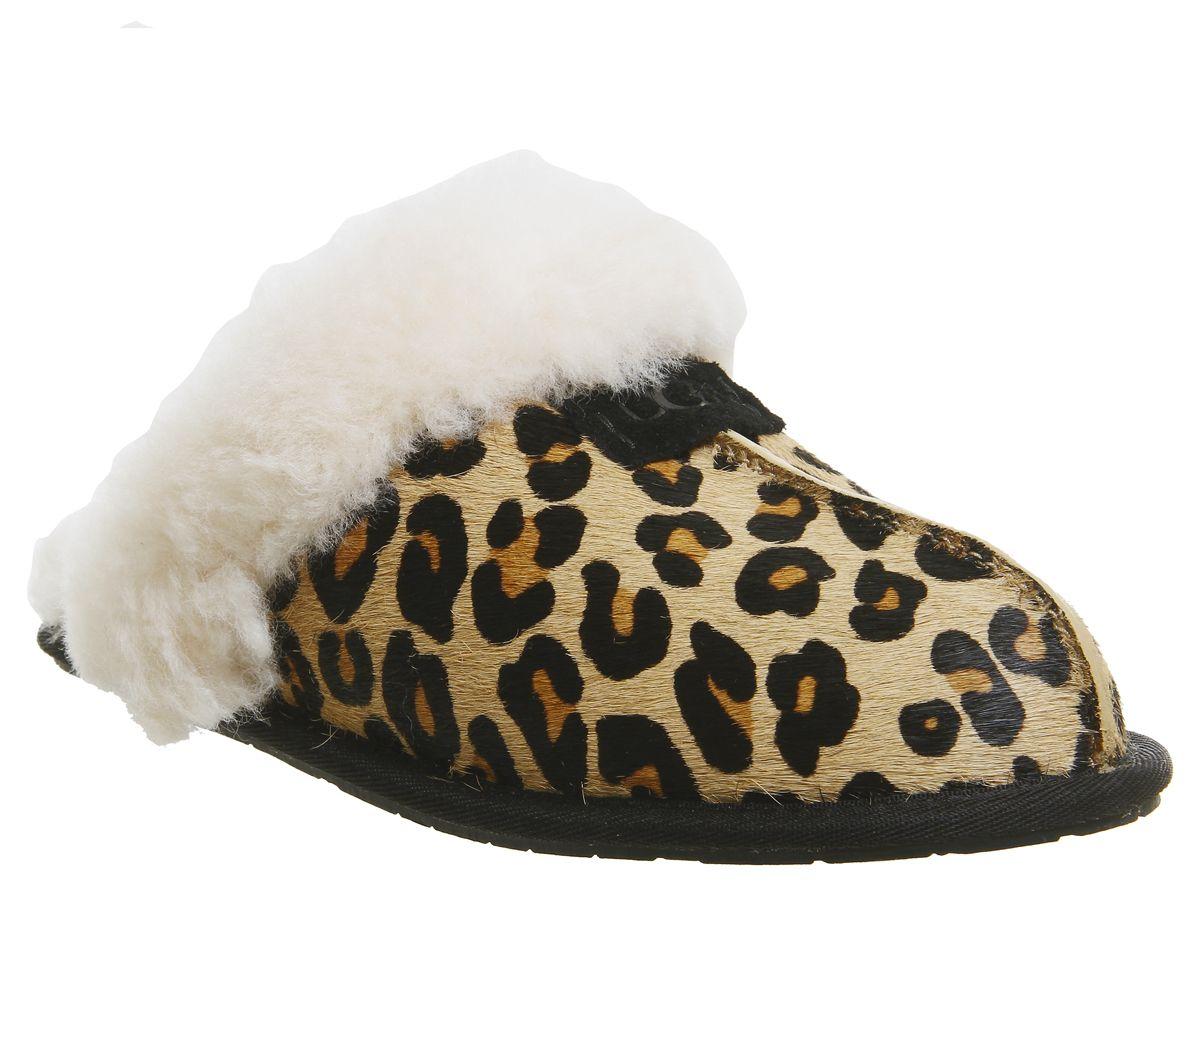 383d7d137f52 UGG Scuffette Ii Slippers Leopard Exclusive - Flats